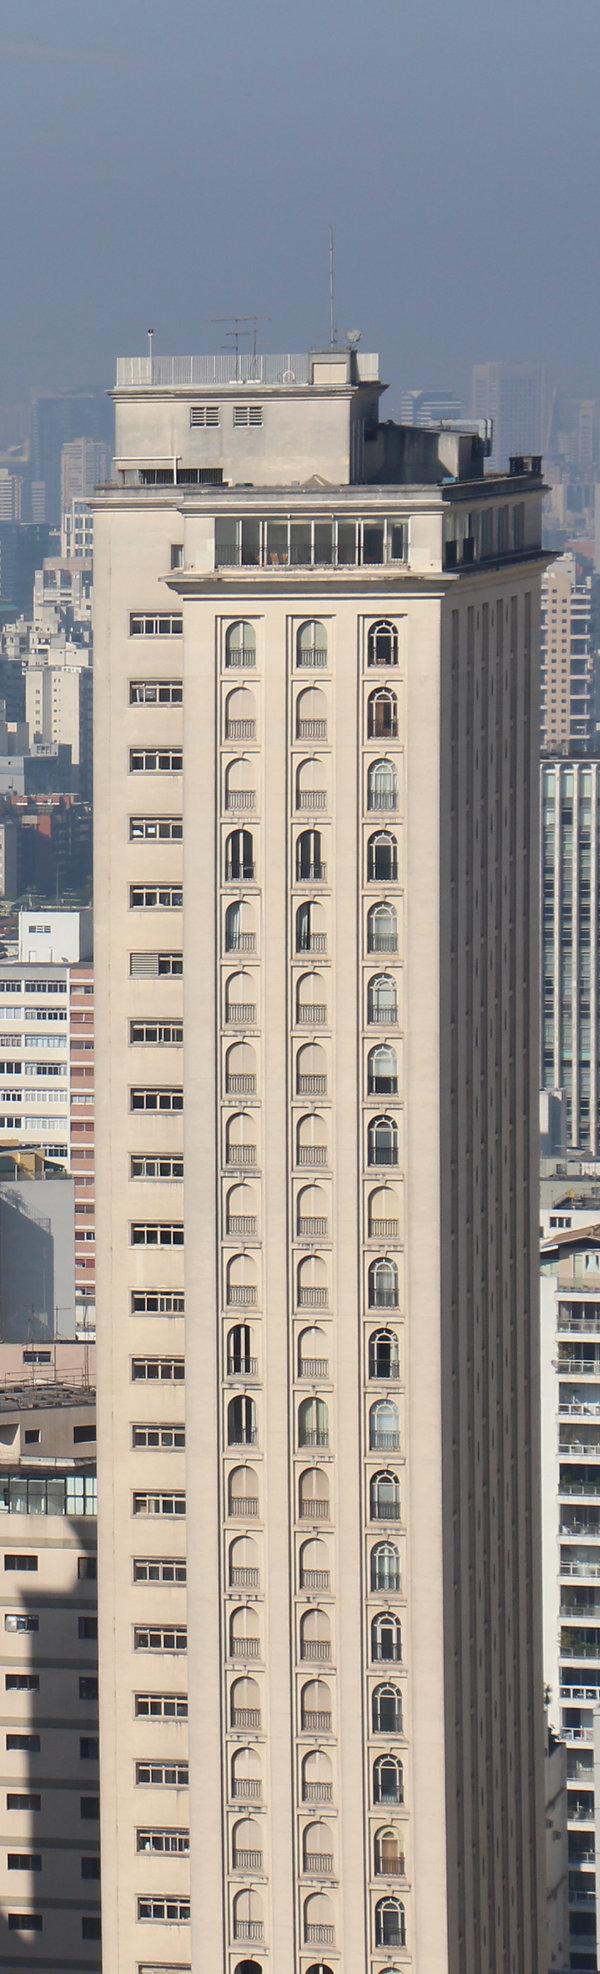 long tower.jpg